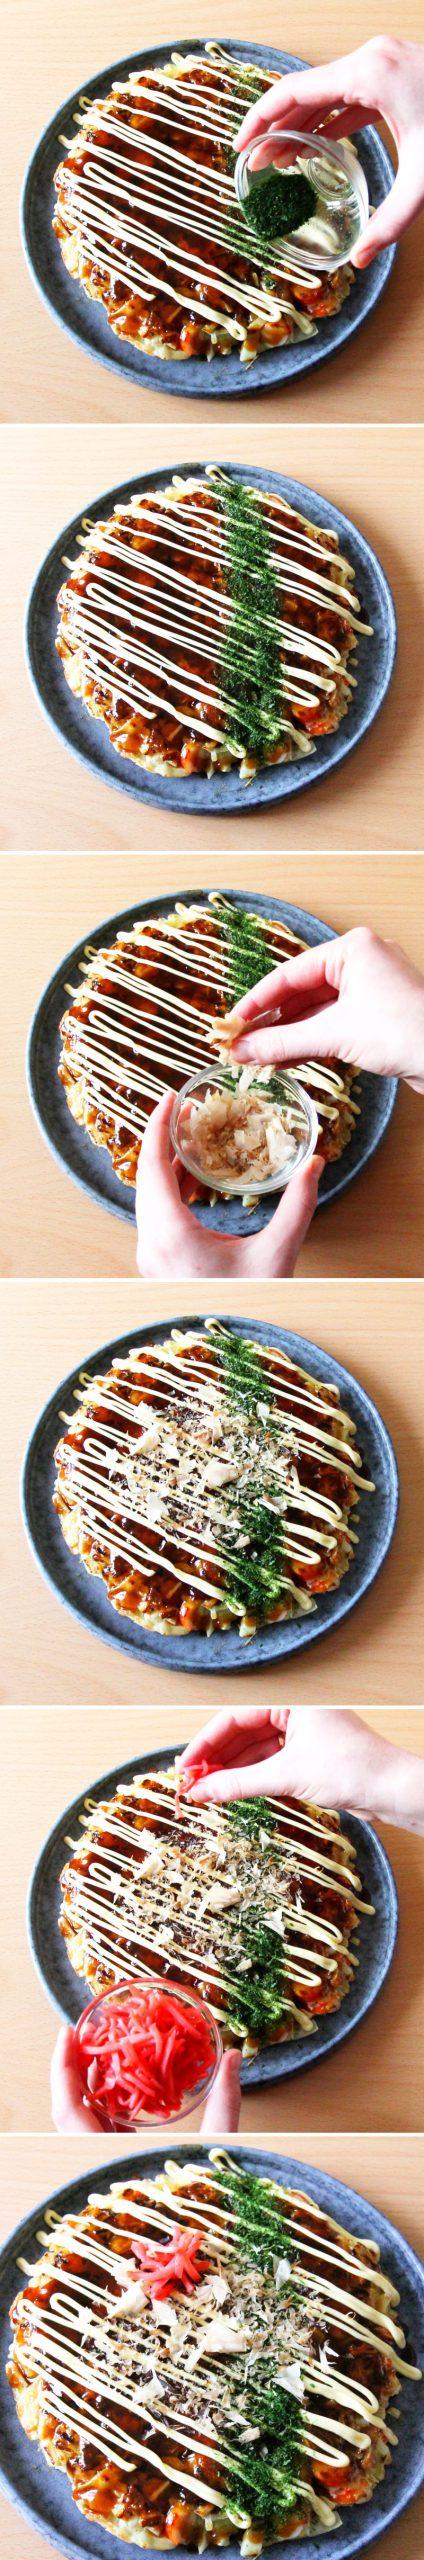 Grundrezept Okonomiyaki Schritt 9 garnieren